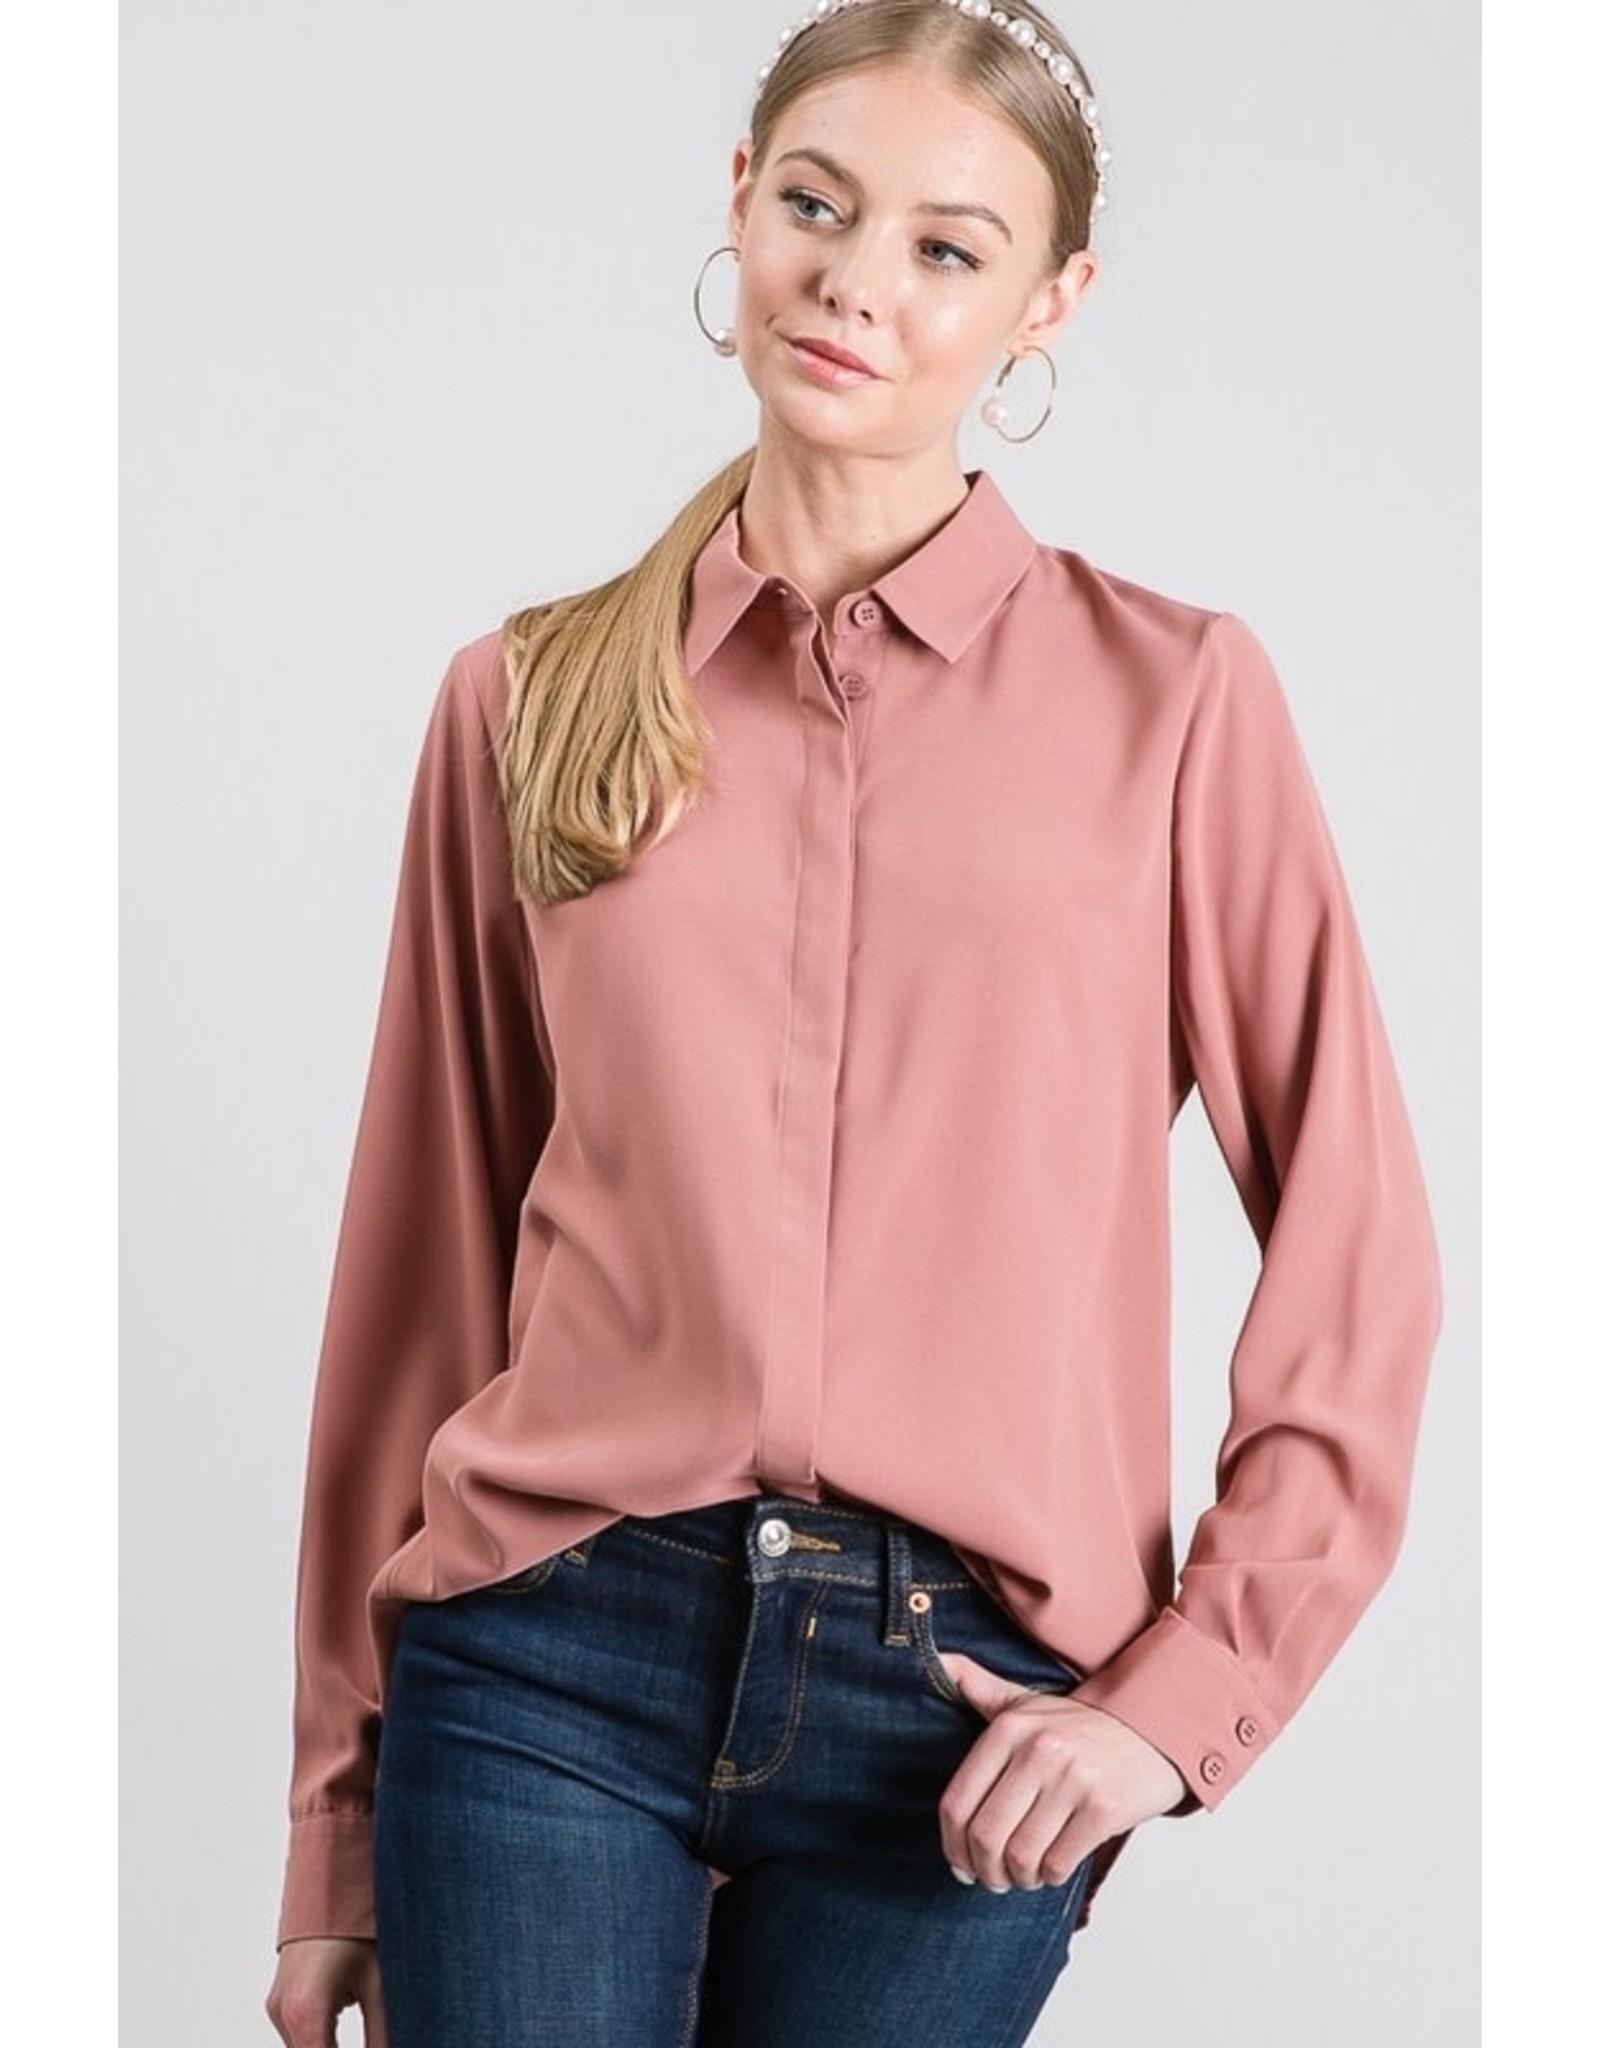 Bonanza - Wednesday Shirt